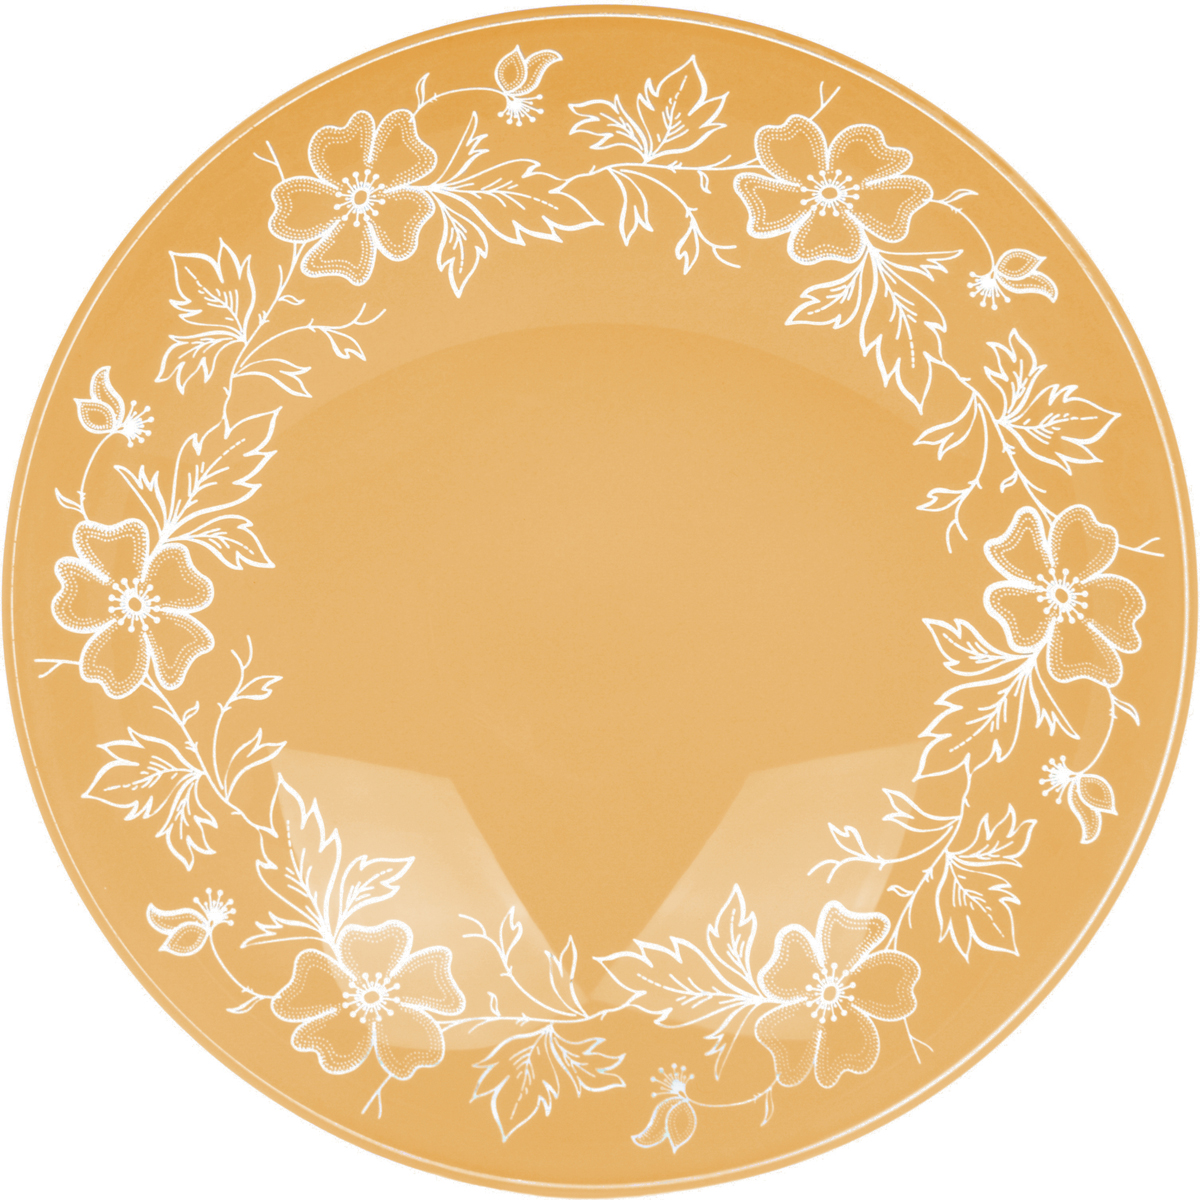 Тарелка Nina Glass Лара, цвет: оранжевый, диаметр 26 см салатник nina glass ажур цвет сиреневый диаметр 16 см